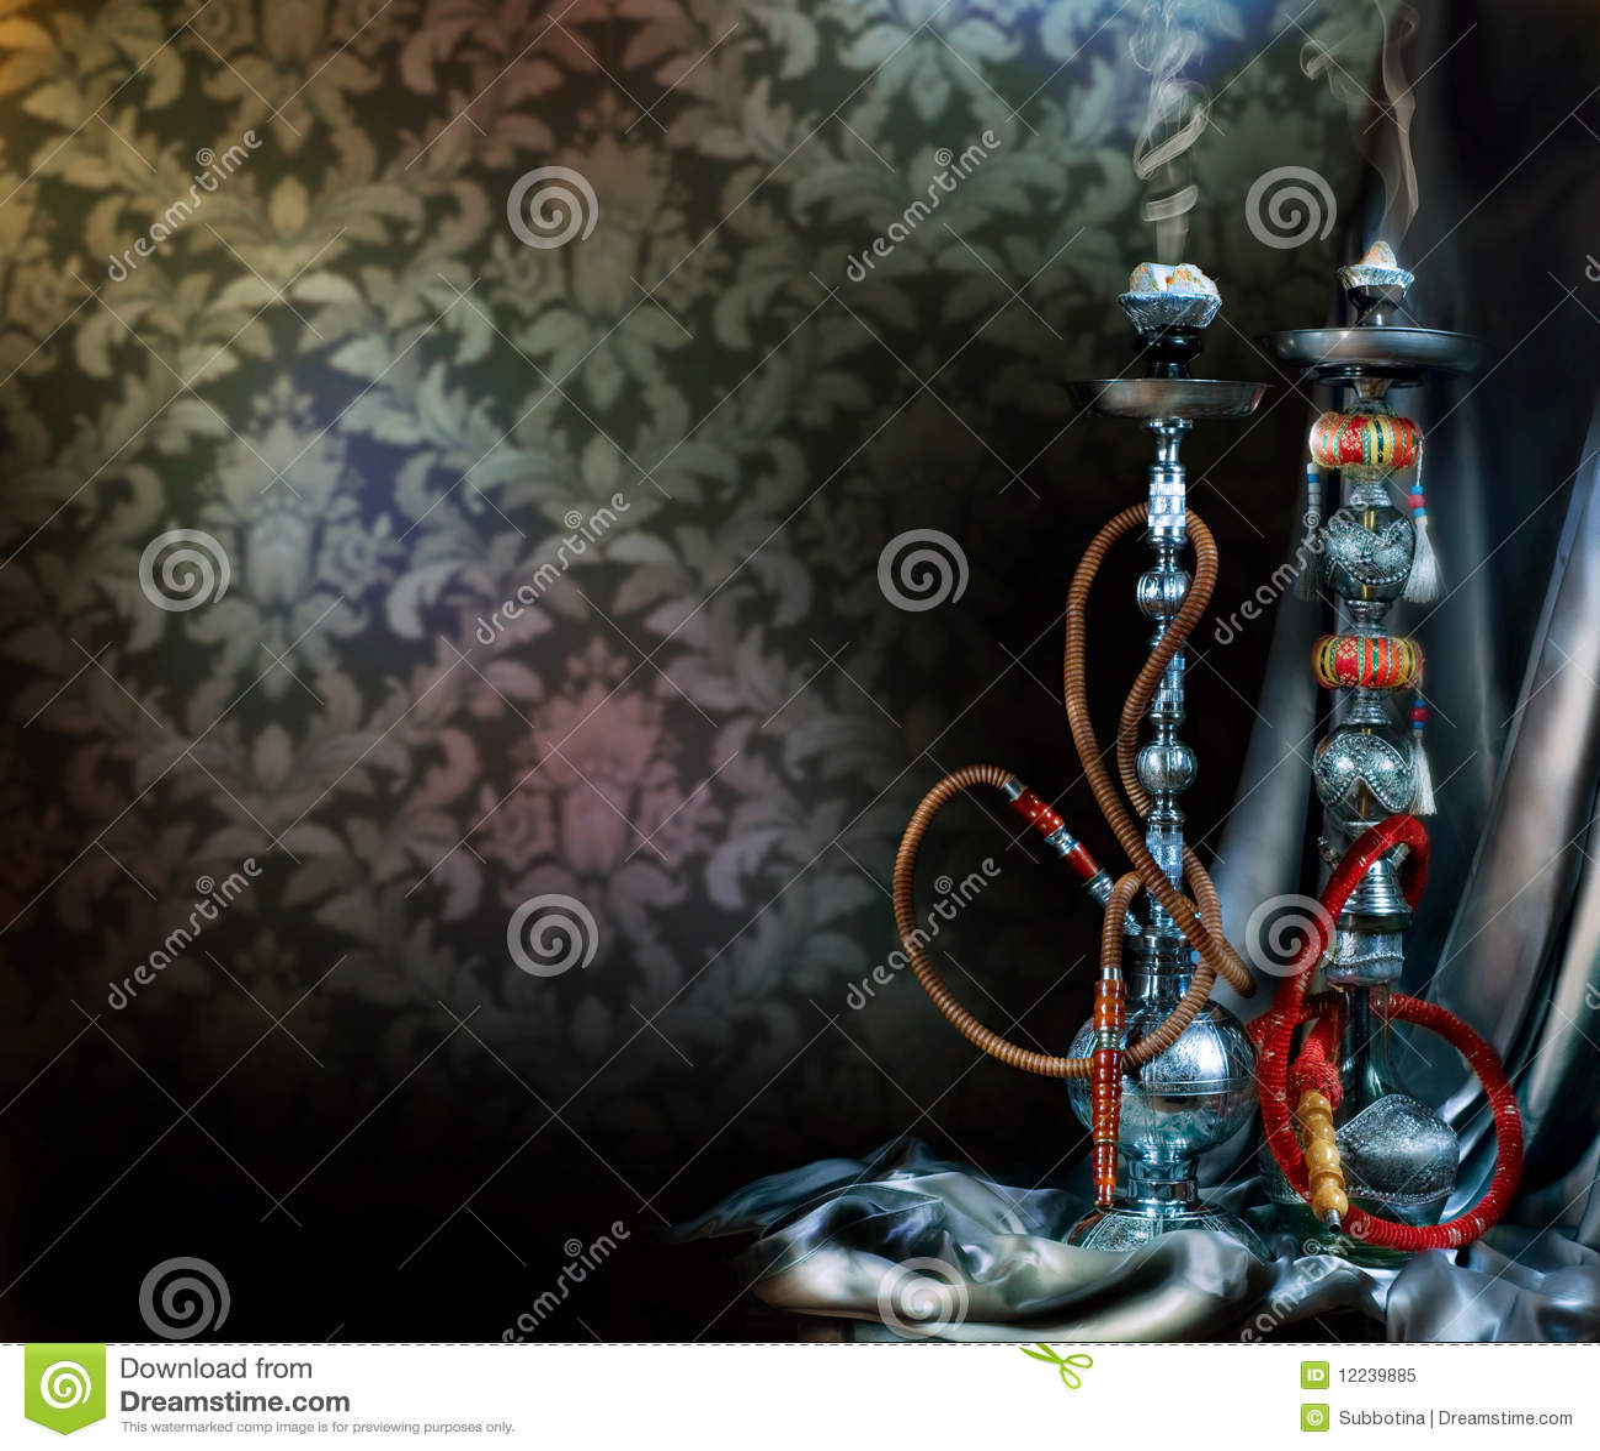 Hookah Hd Wallpaper Hookah Or Shisha Stock Image Image Of Isolated Inhale